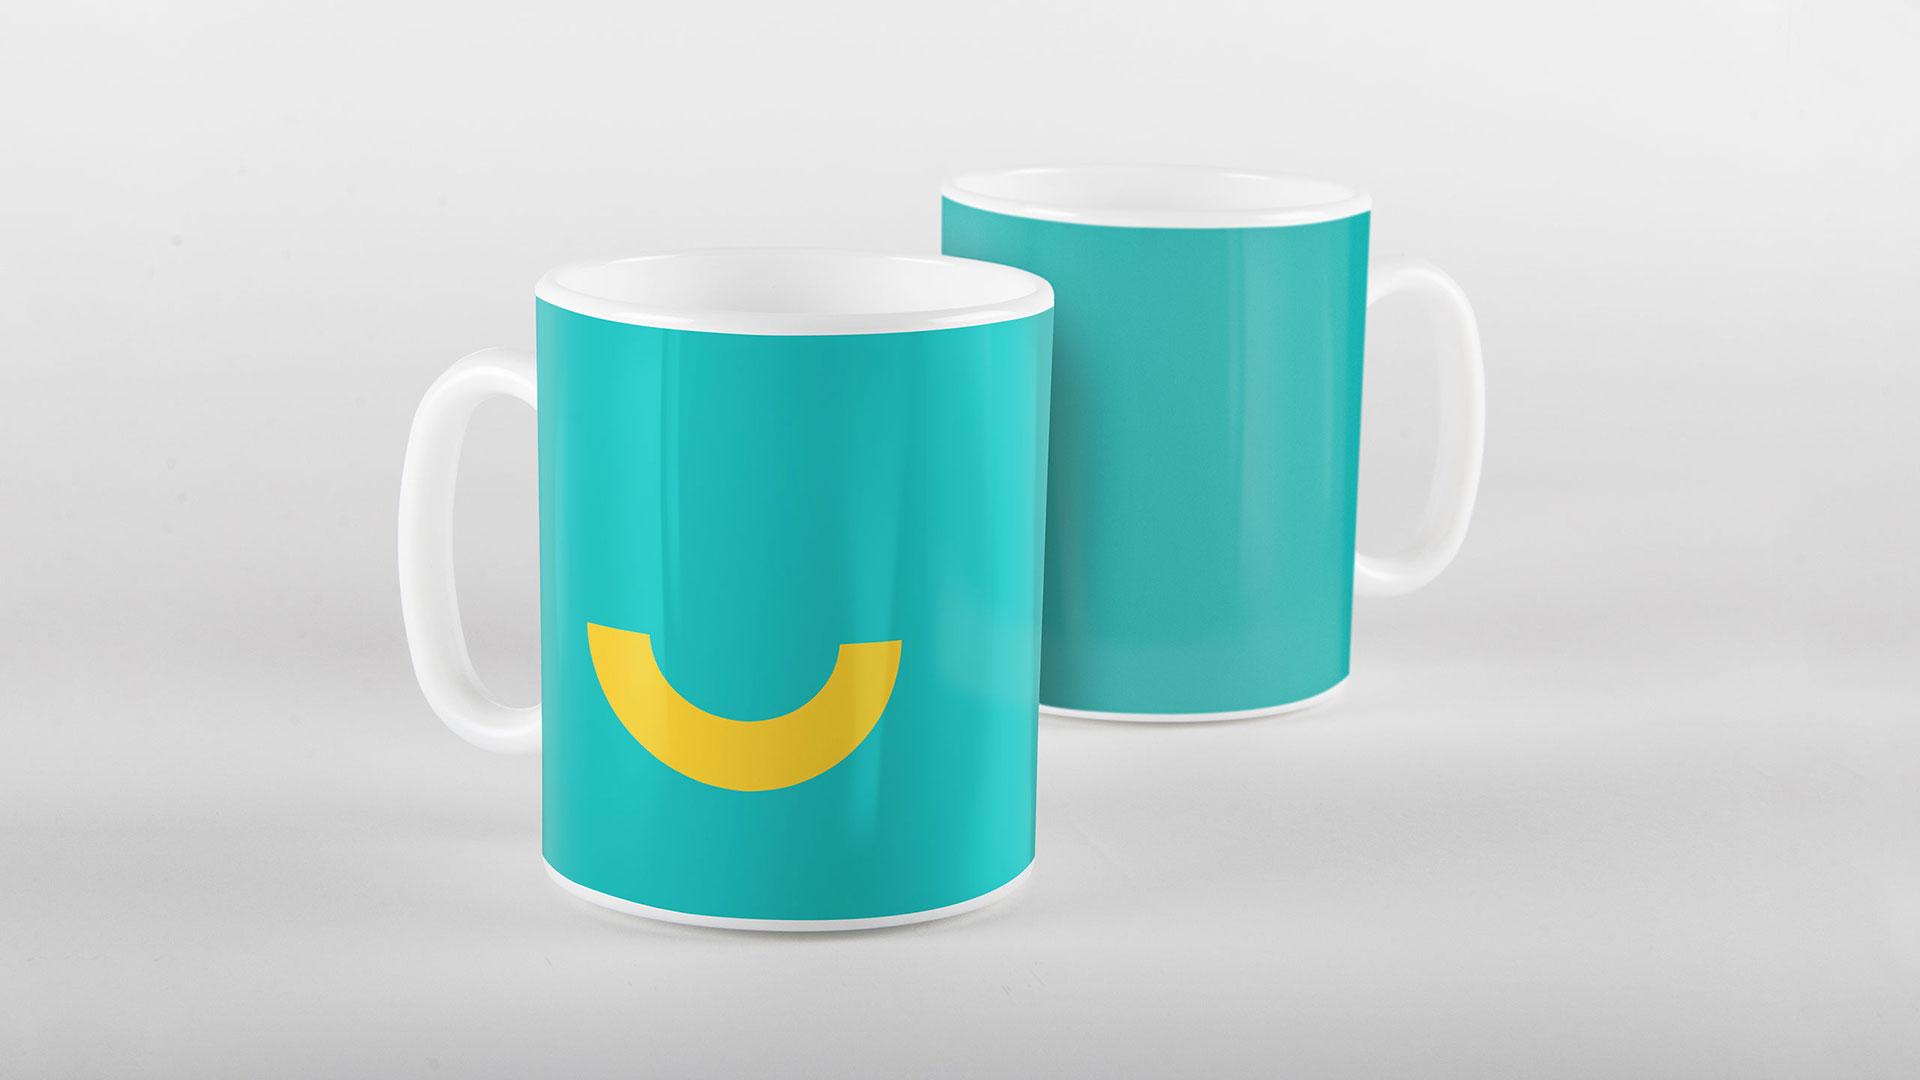 05_florian_branchet_designer_graphique_touloisirs_mug